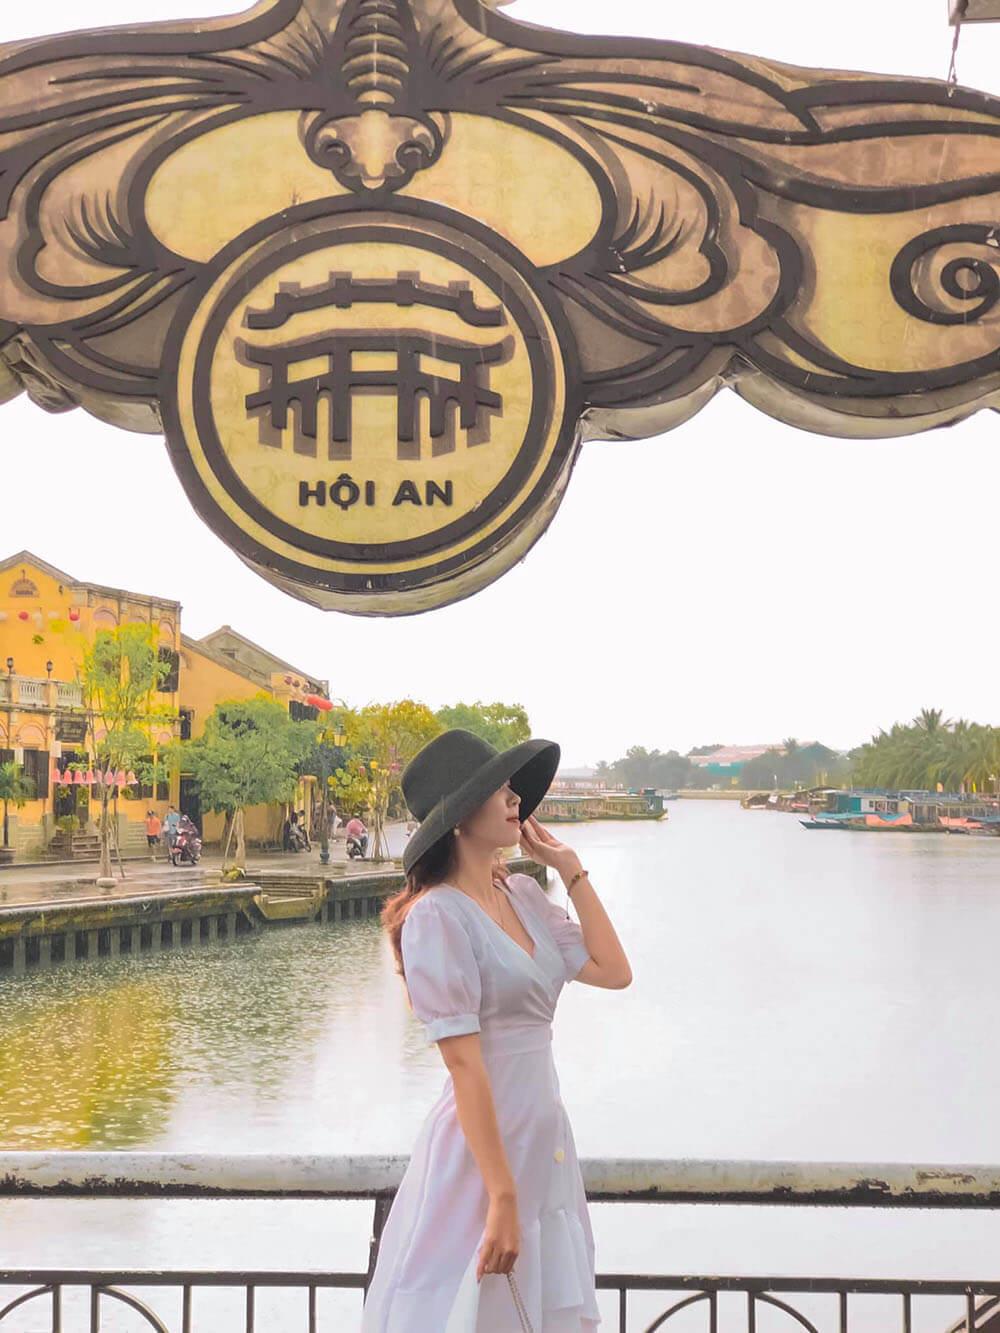 Pho Co Hoi An Review Hue Da Nang Hoi An Ninh Binh 7n7d Chi Voi 8 Trieu Tin Duoc Khong 02